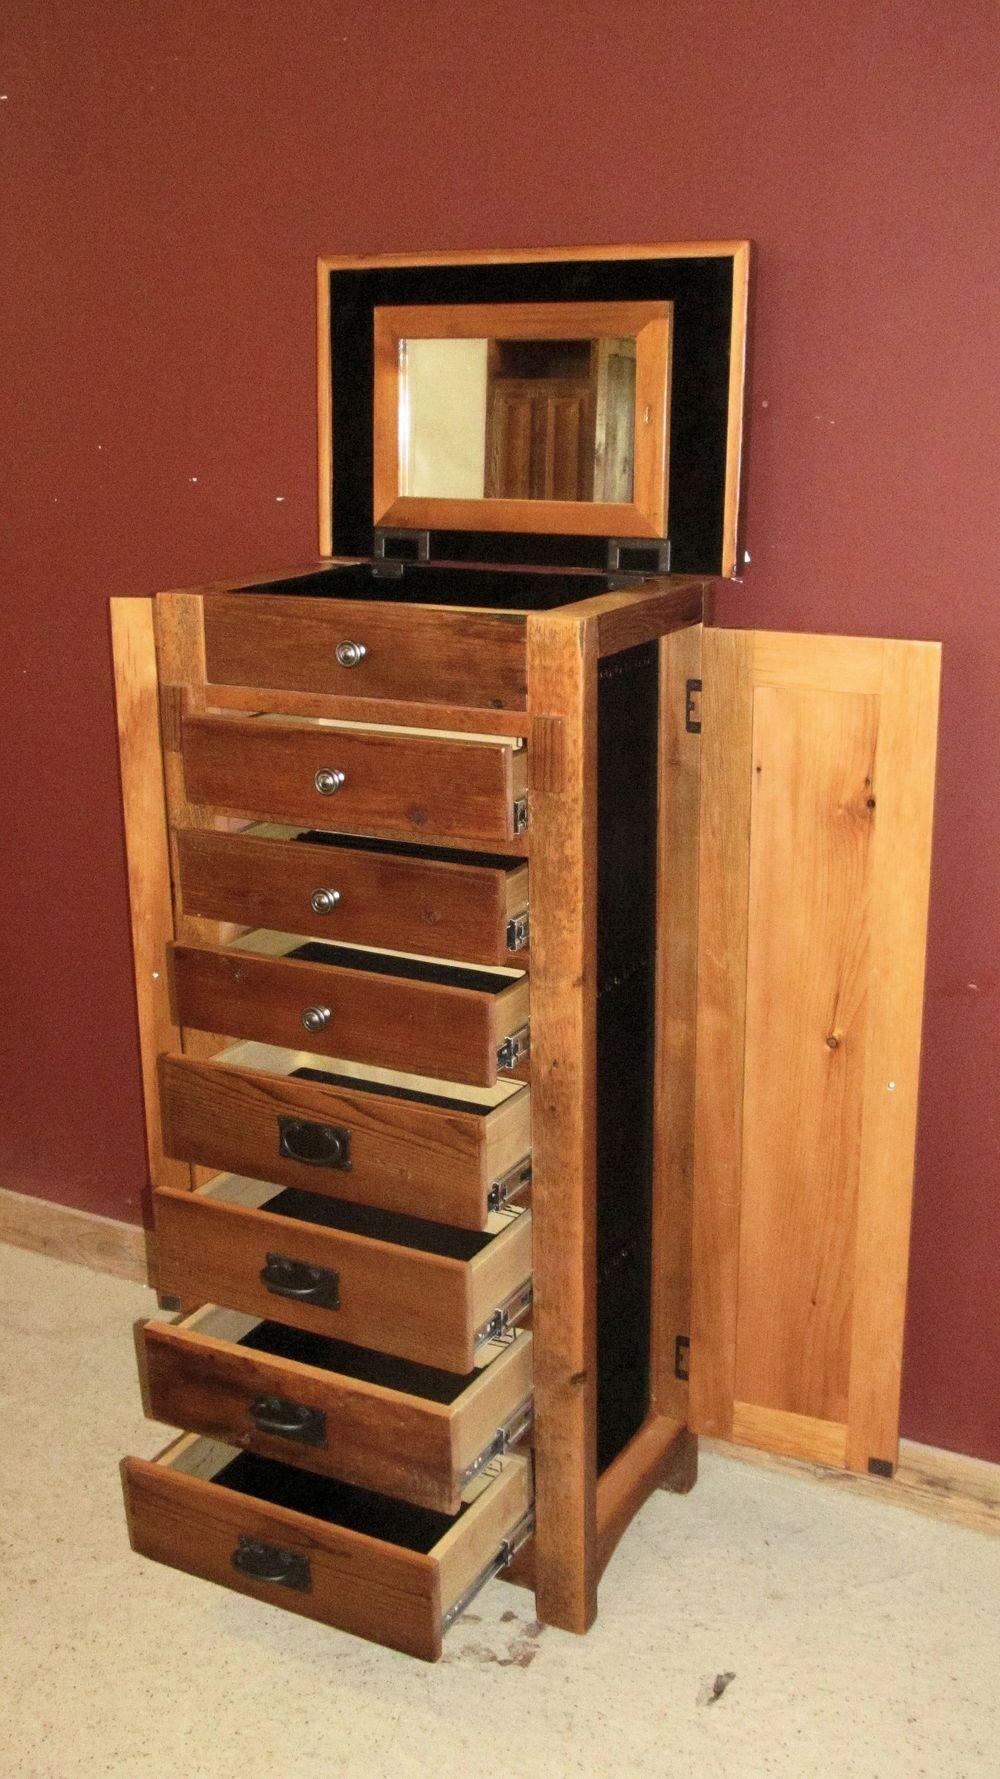 barn wood jewelry box chest - Wood Jewelry Box